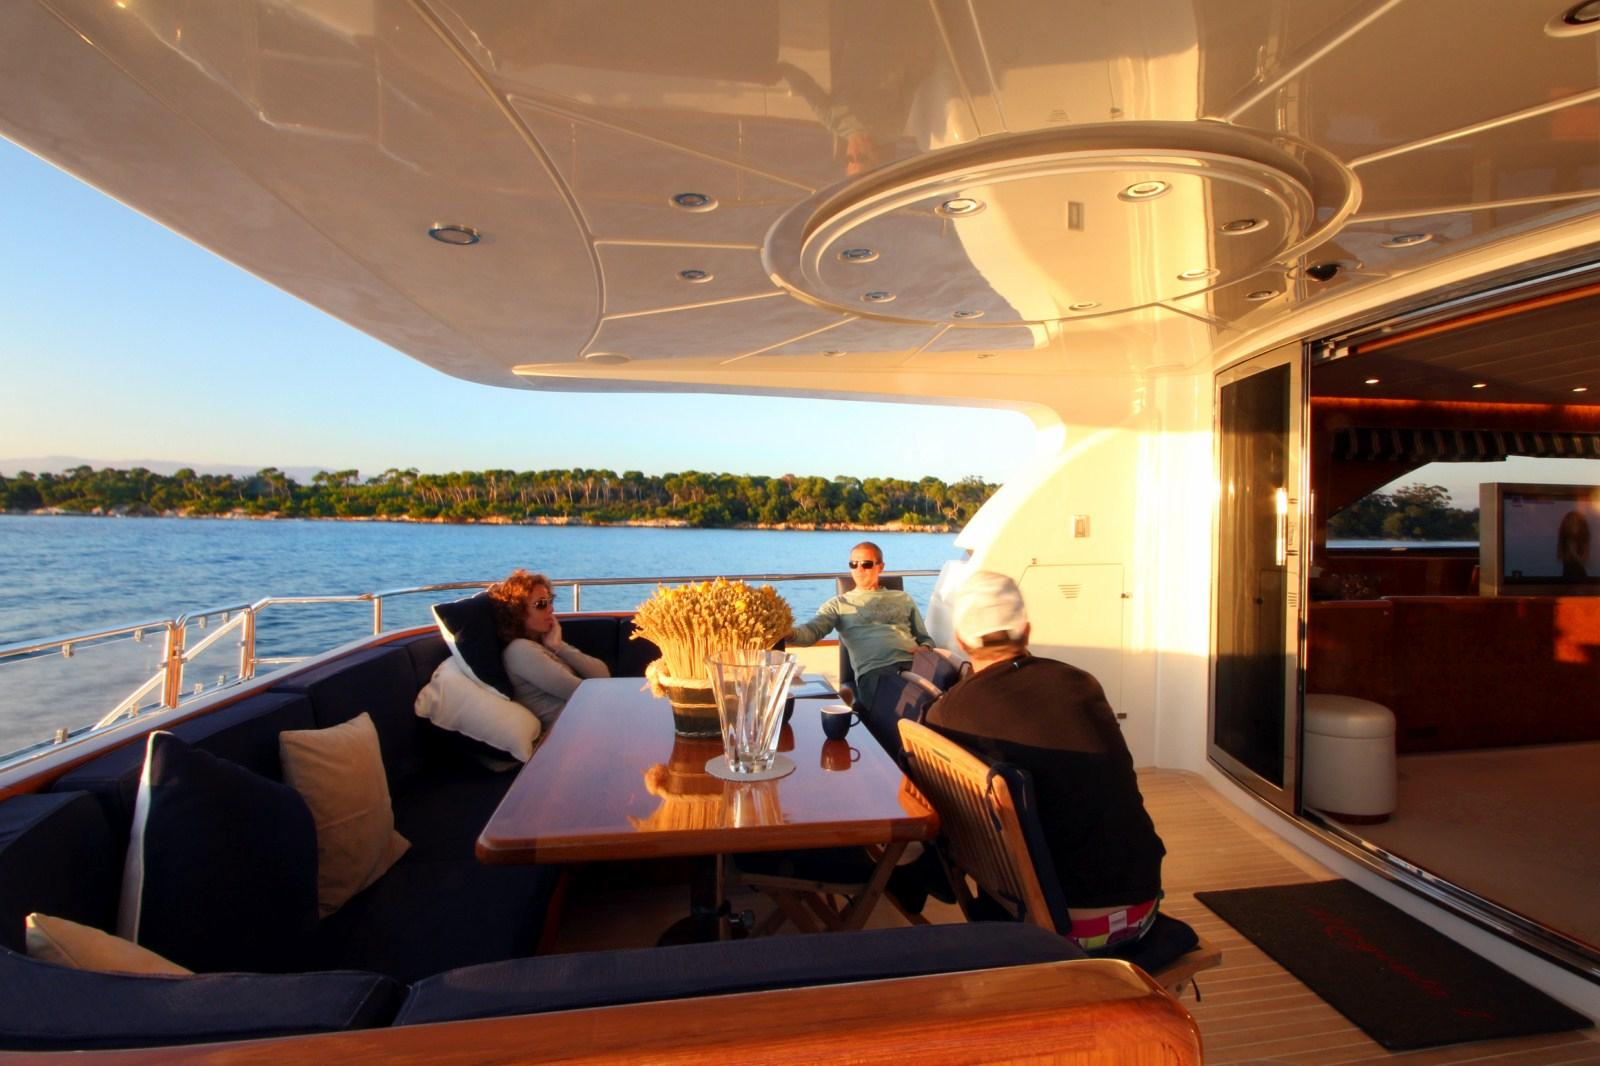 Aft deck view